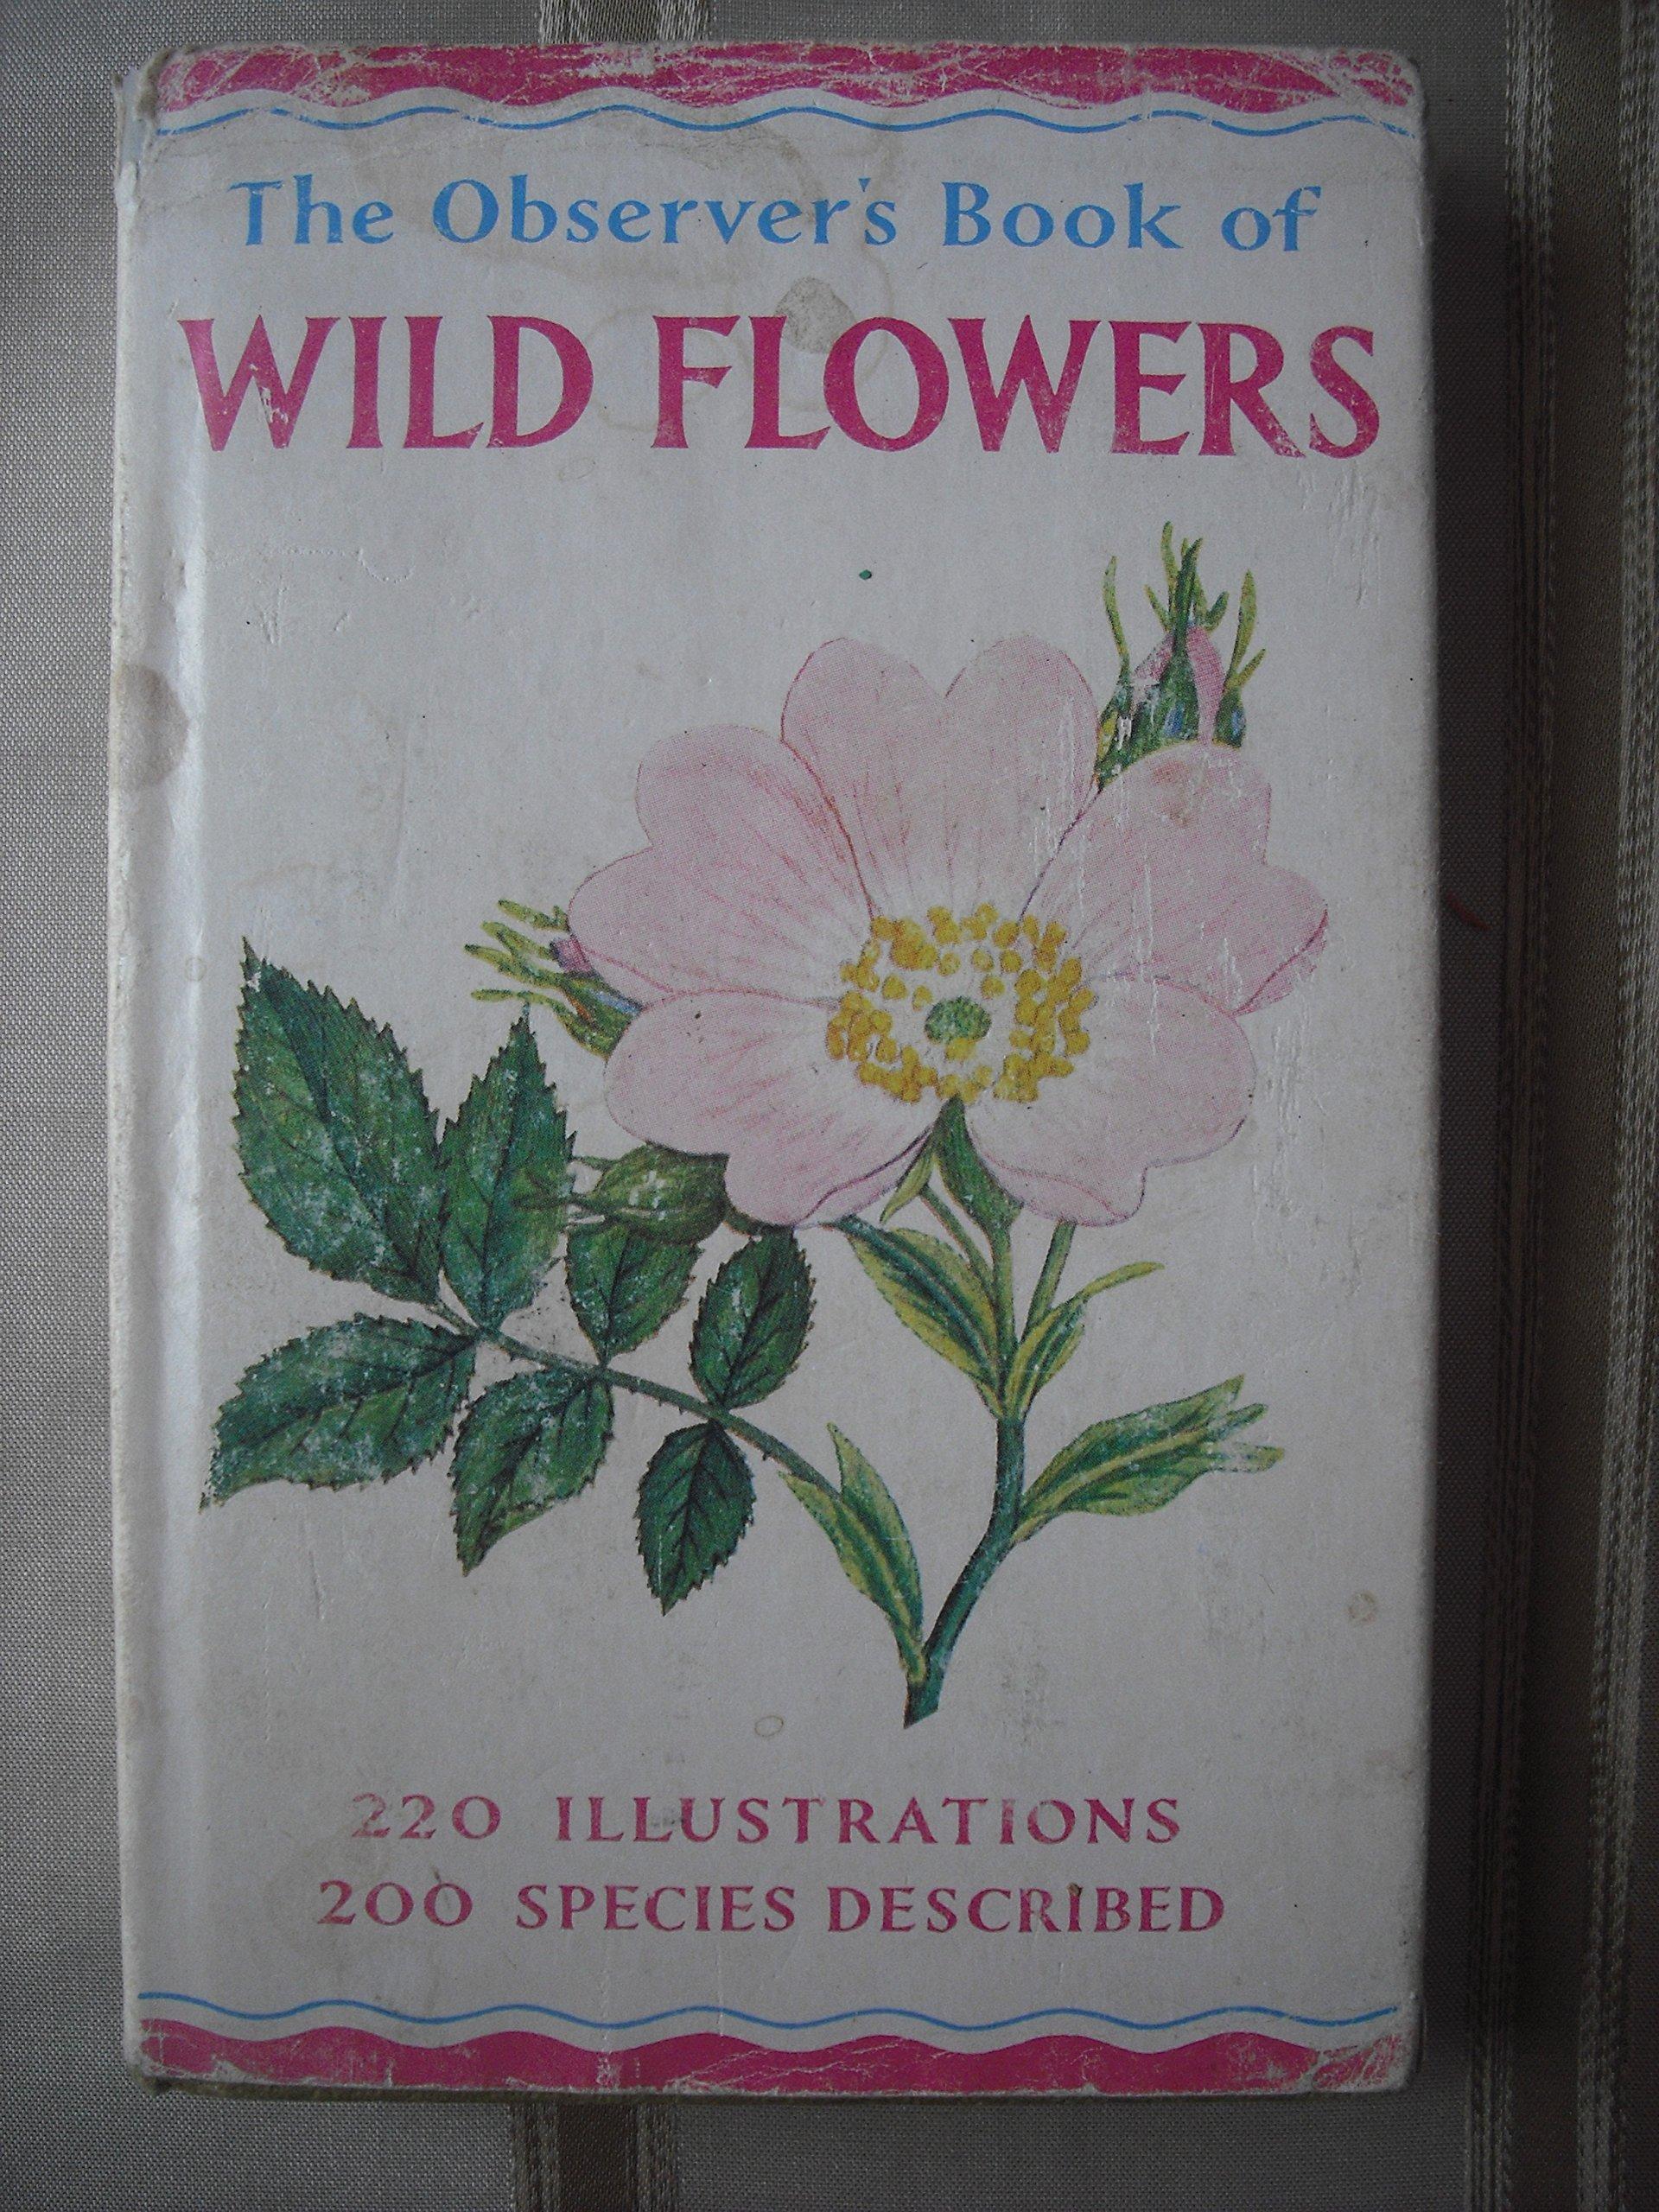 The Observer's Book of Wild Flowers: W. J. Stokoe: 7436790882527: Books -  Amazon.ca